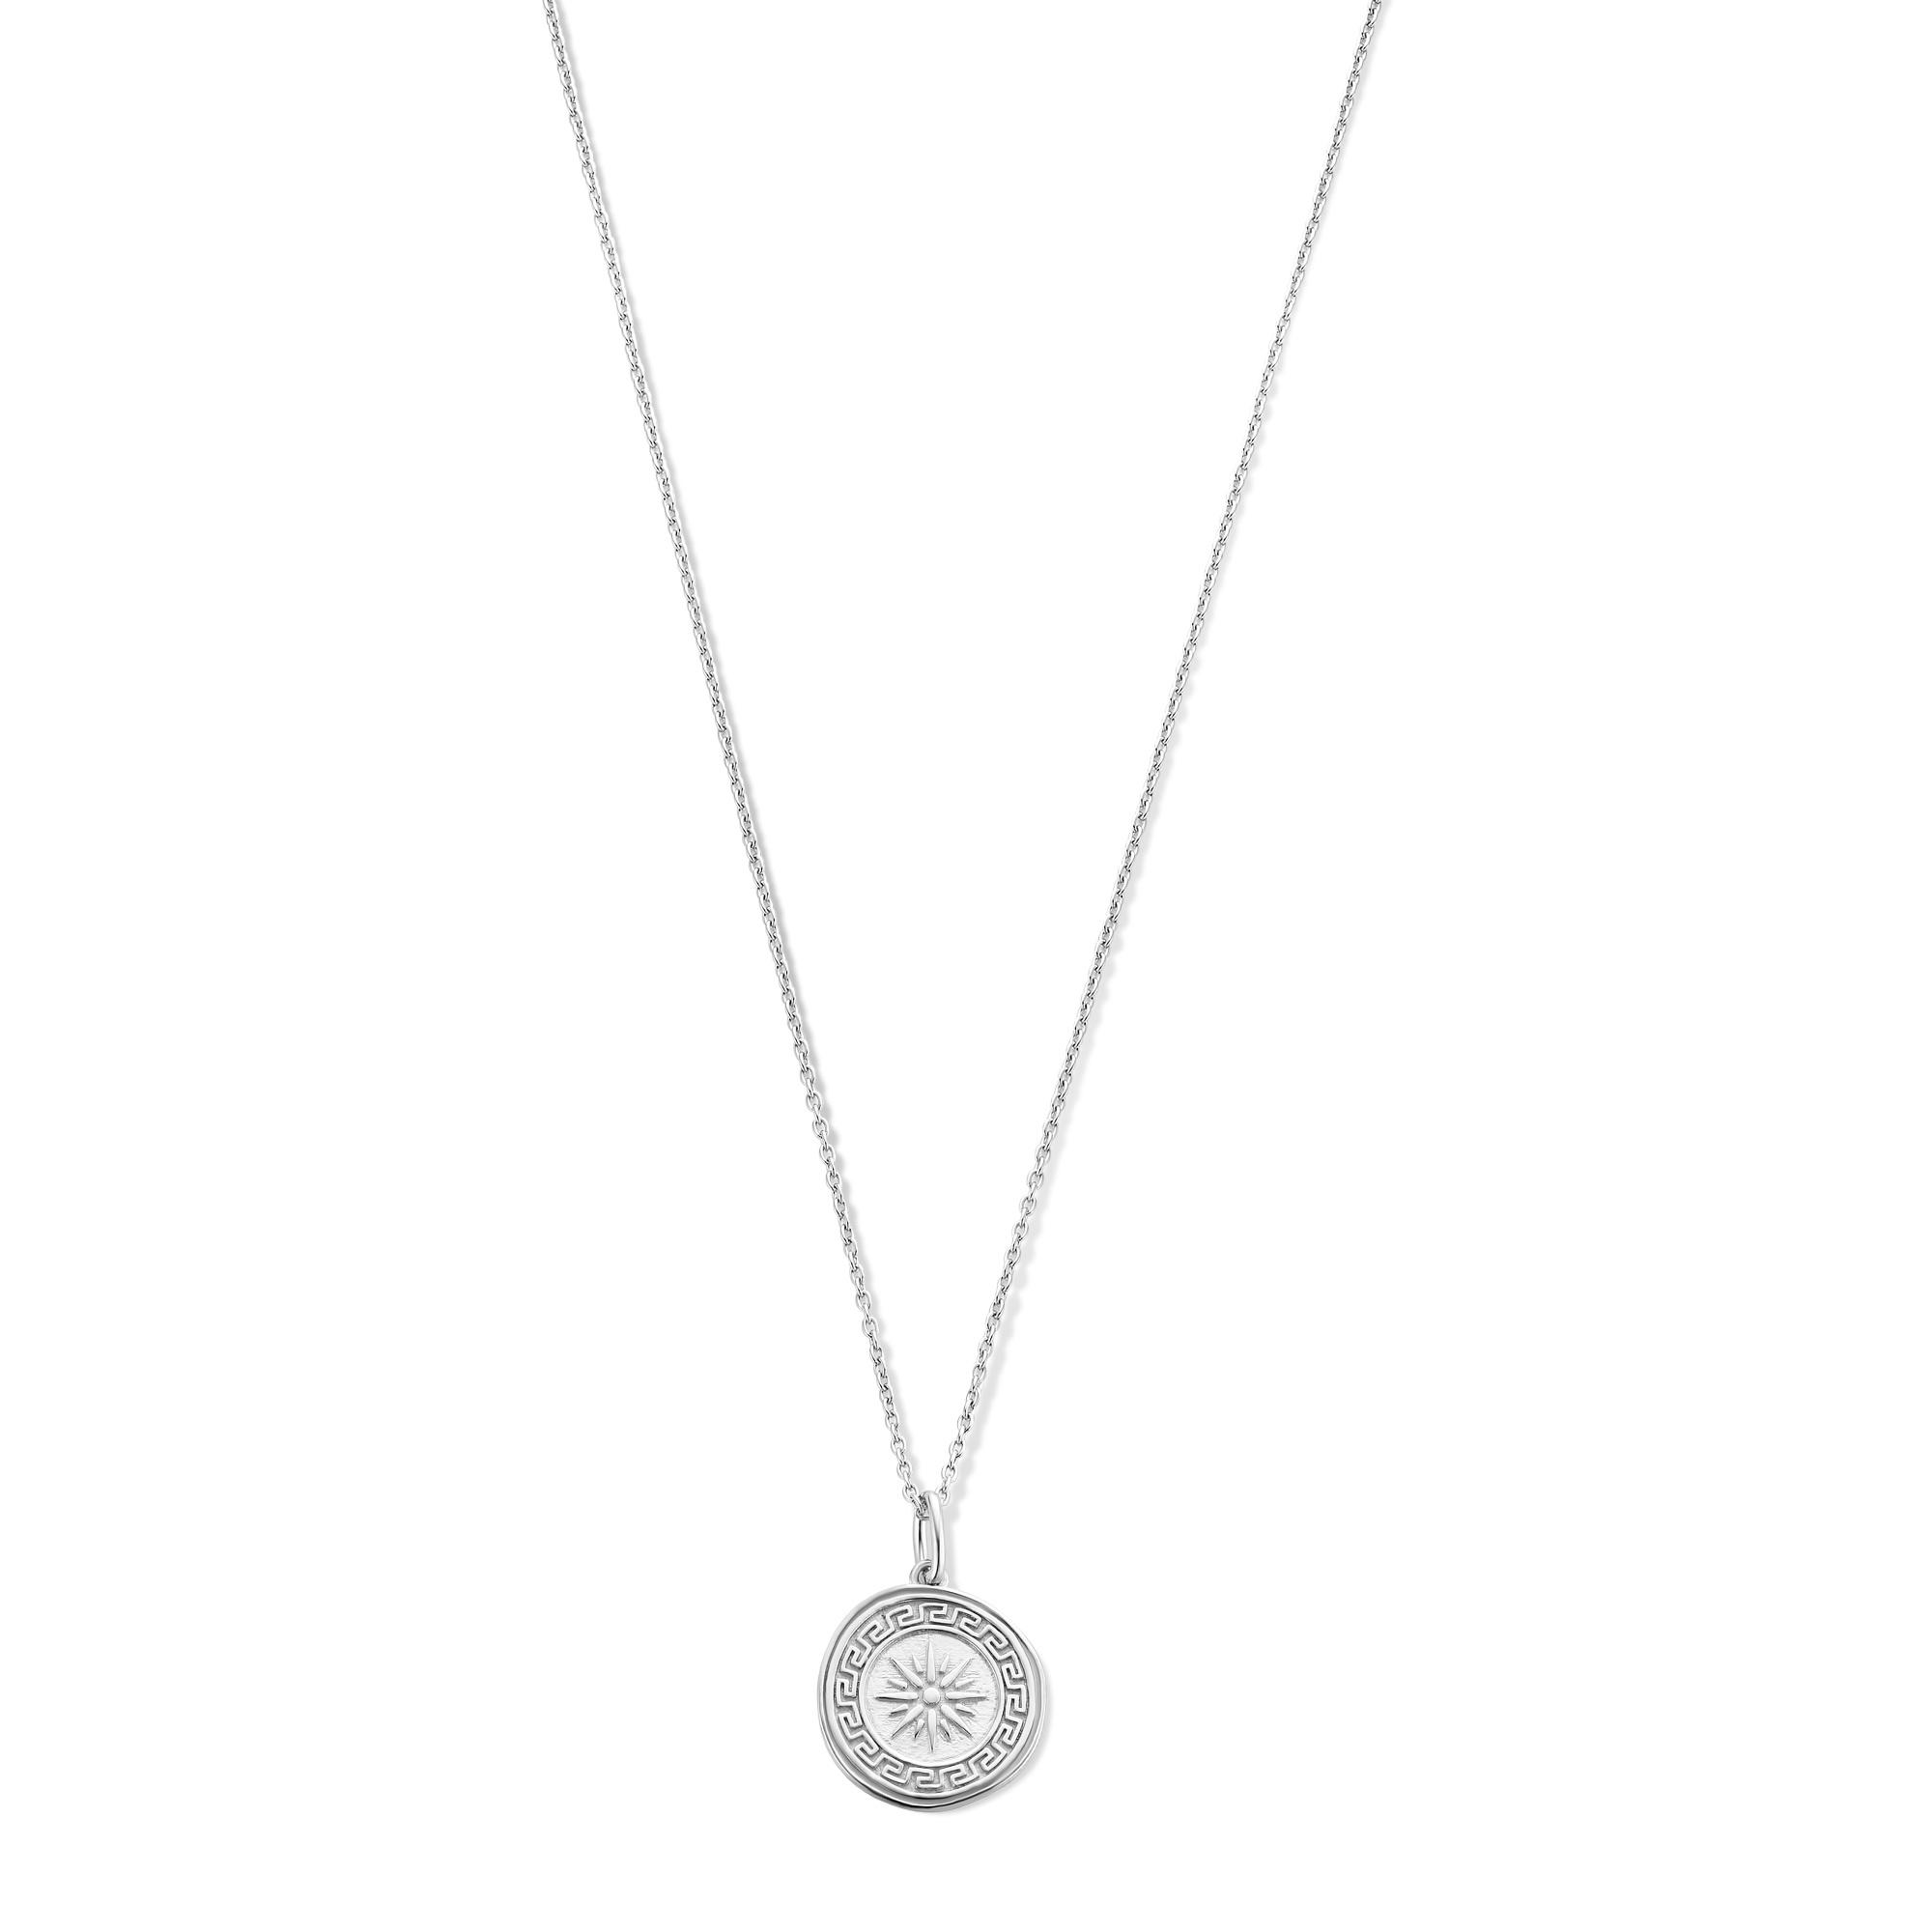 Violet Hamden Athens 925 Sterling Silber Kette mit Münze